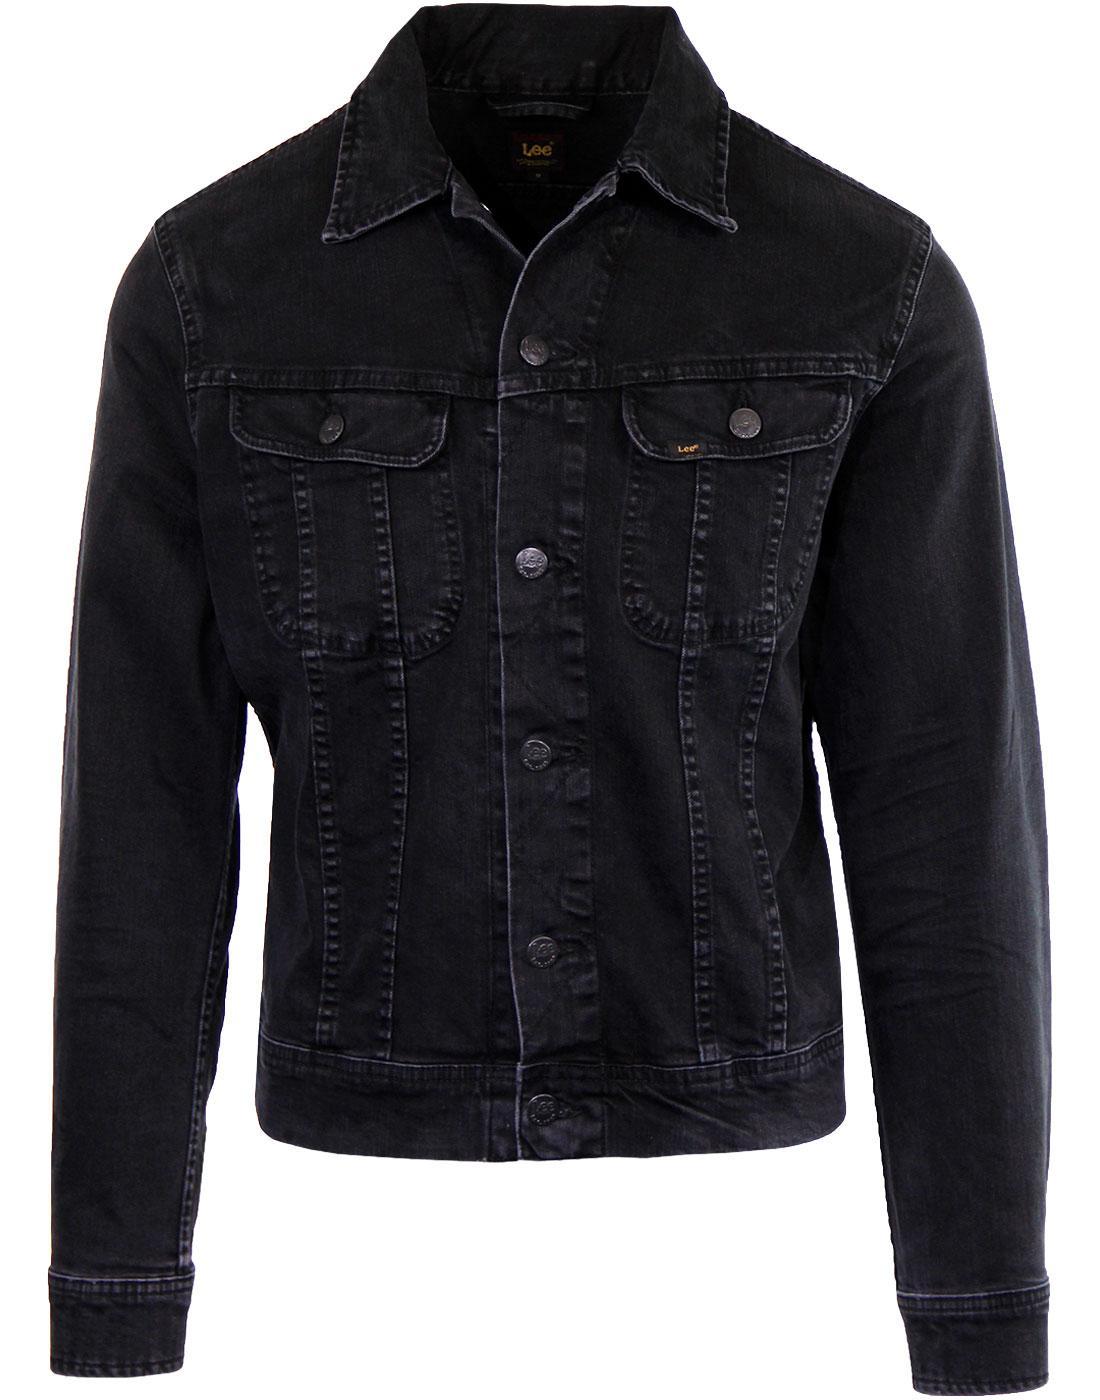 LEE Rider Retro Mod Slim Western Denim Jacket (DR)